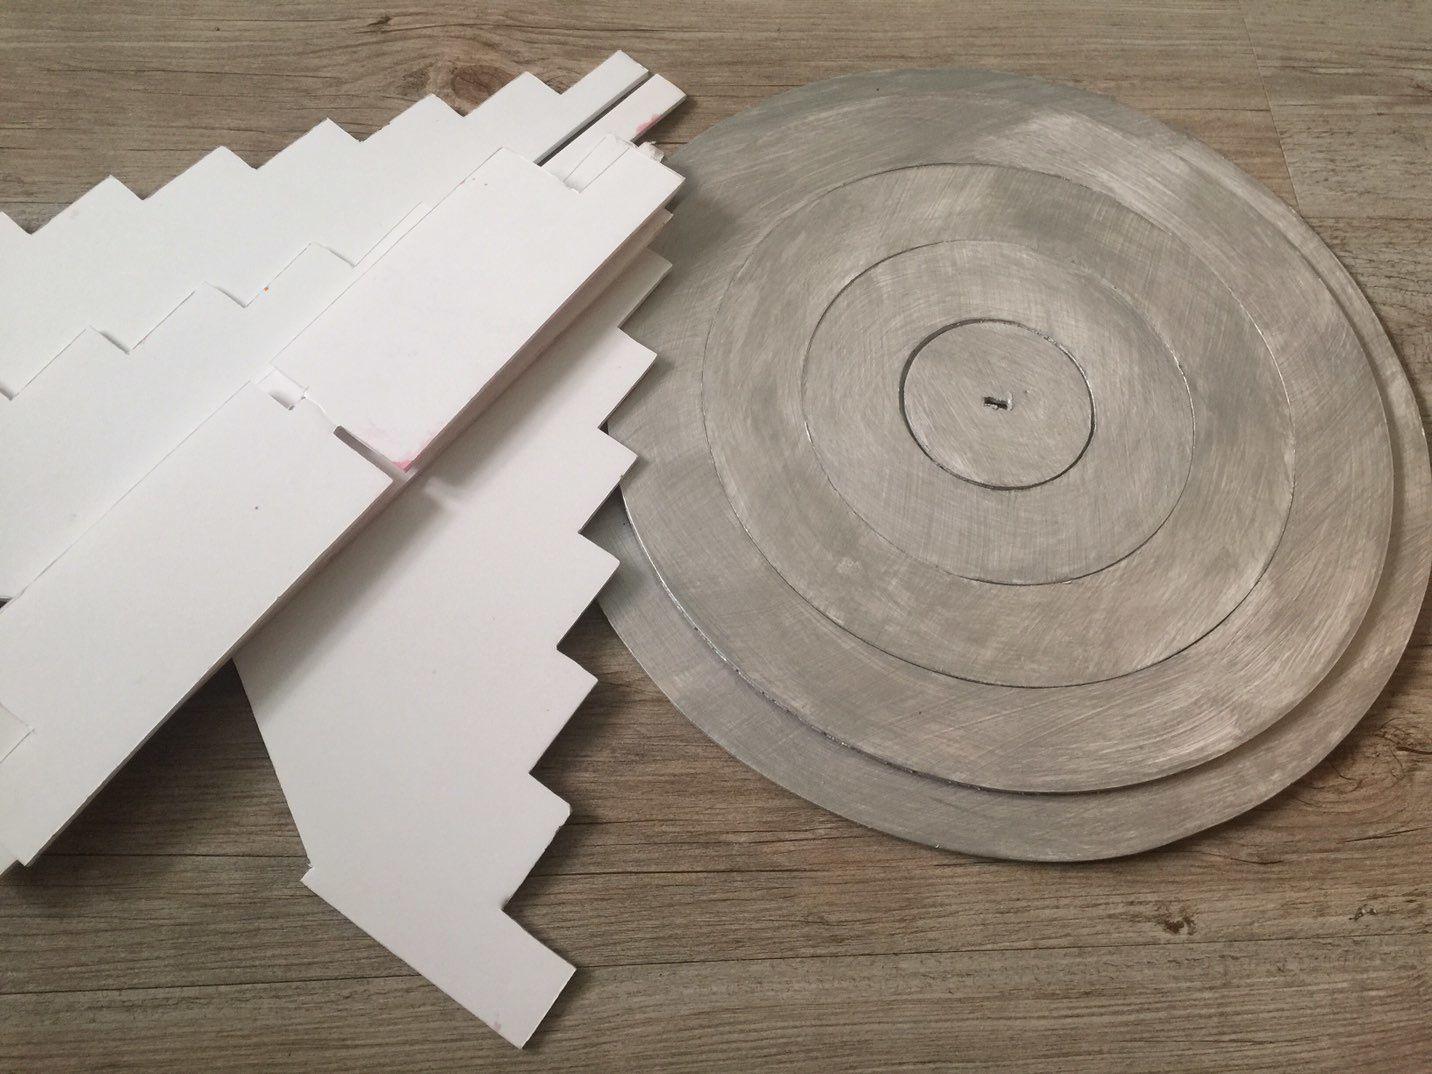 Fabriquer une pyramide en carton plume pour 100 macarons